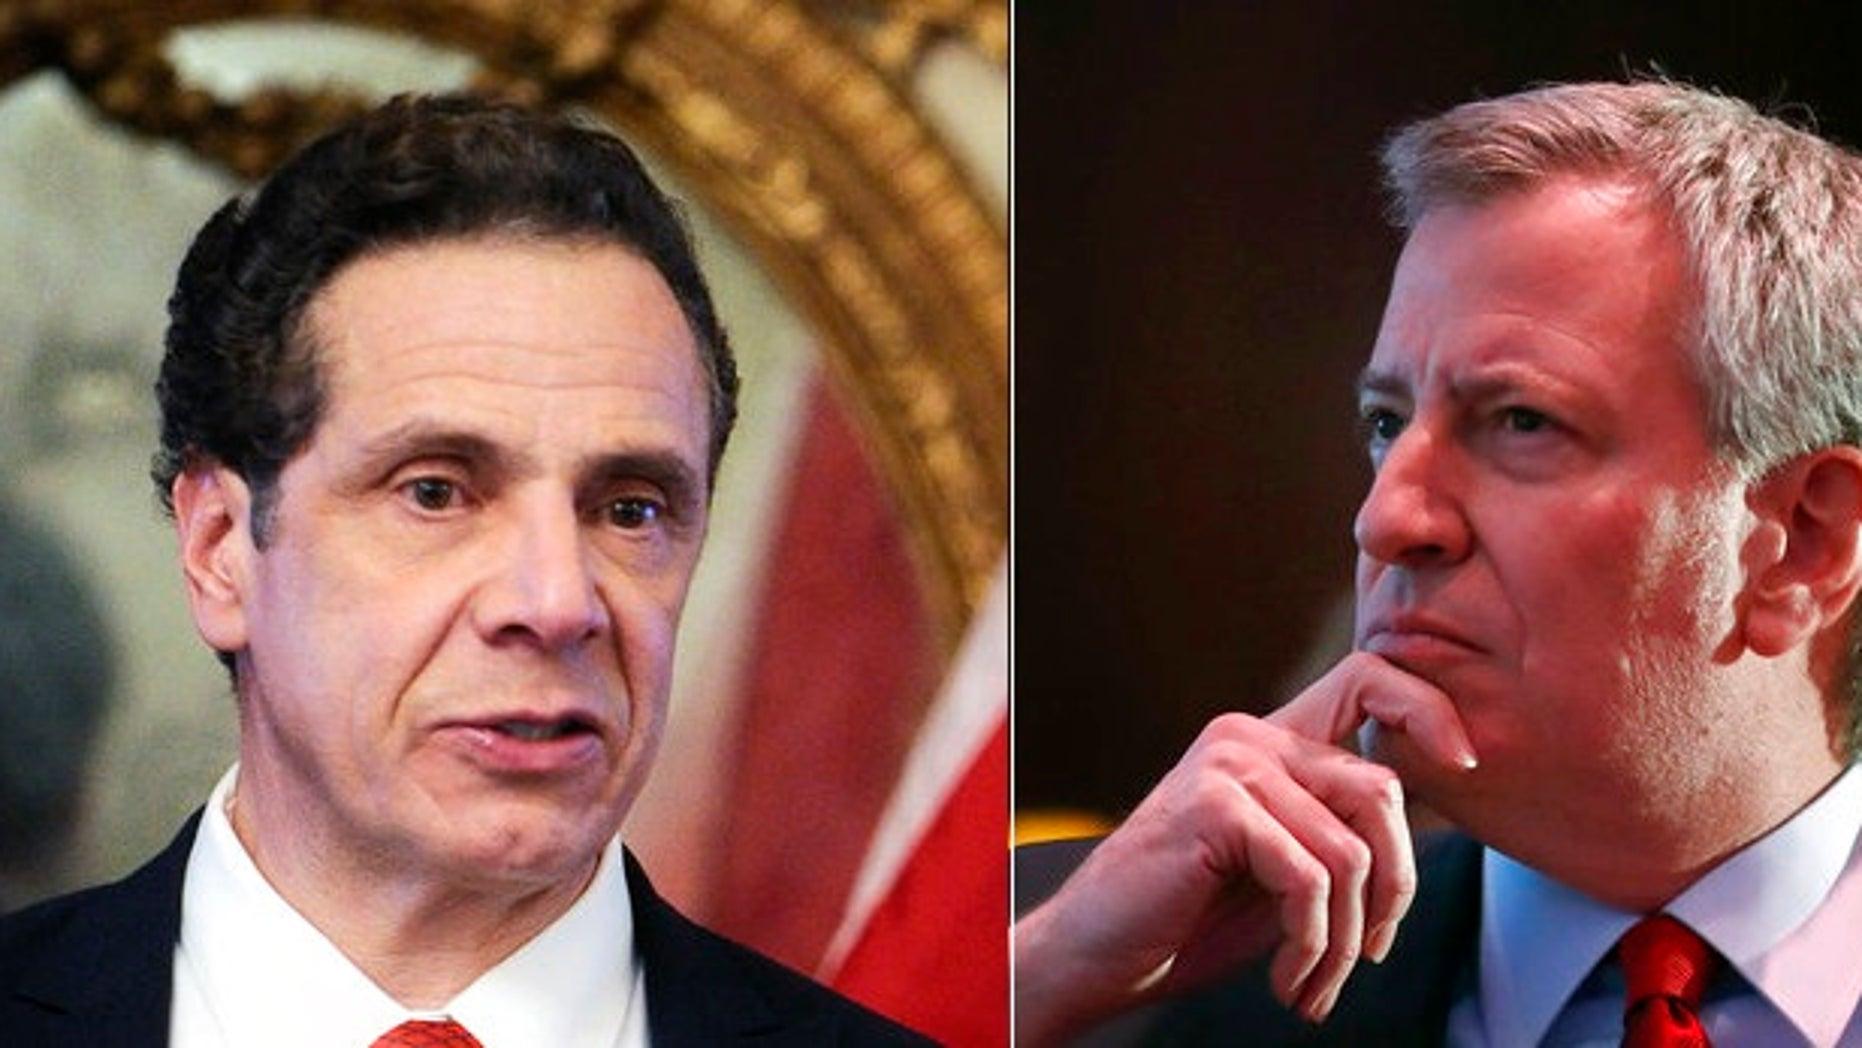 Despite both being Democrats, New York Gov. Andrew Cuomo, left, and New York City Mayor Bill de Blasio often fail to see eye to eye.